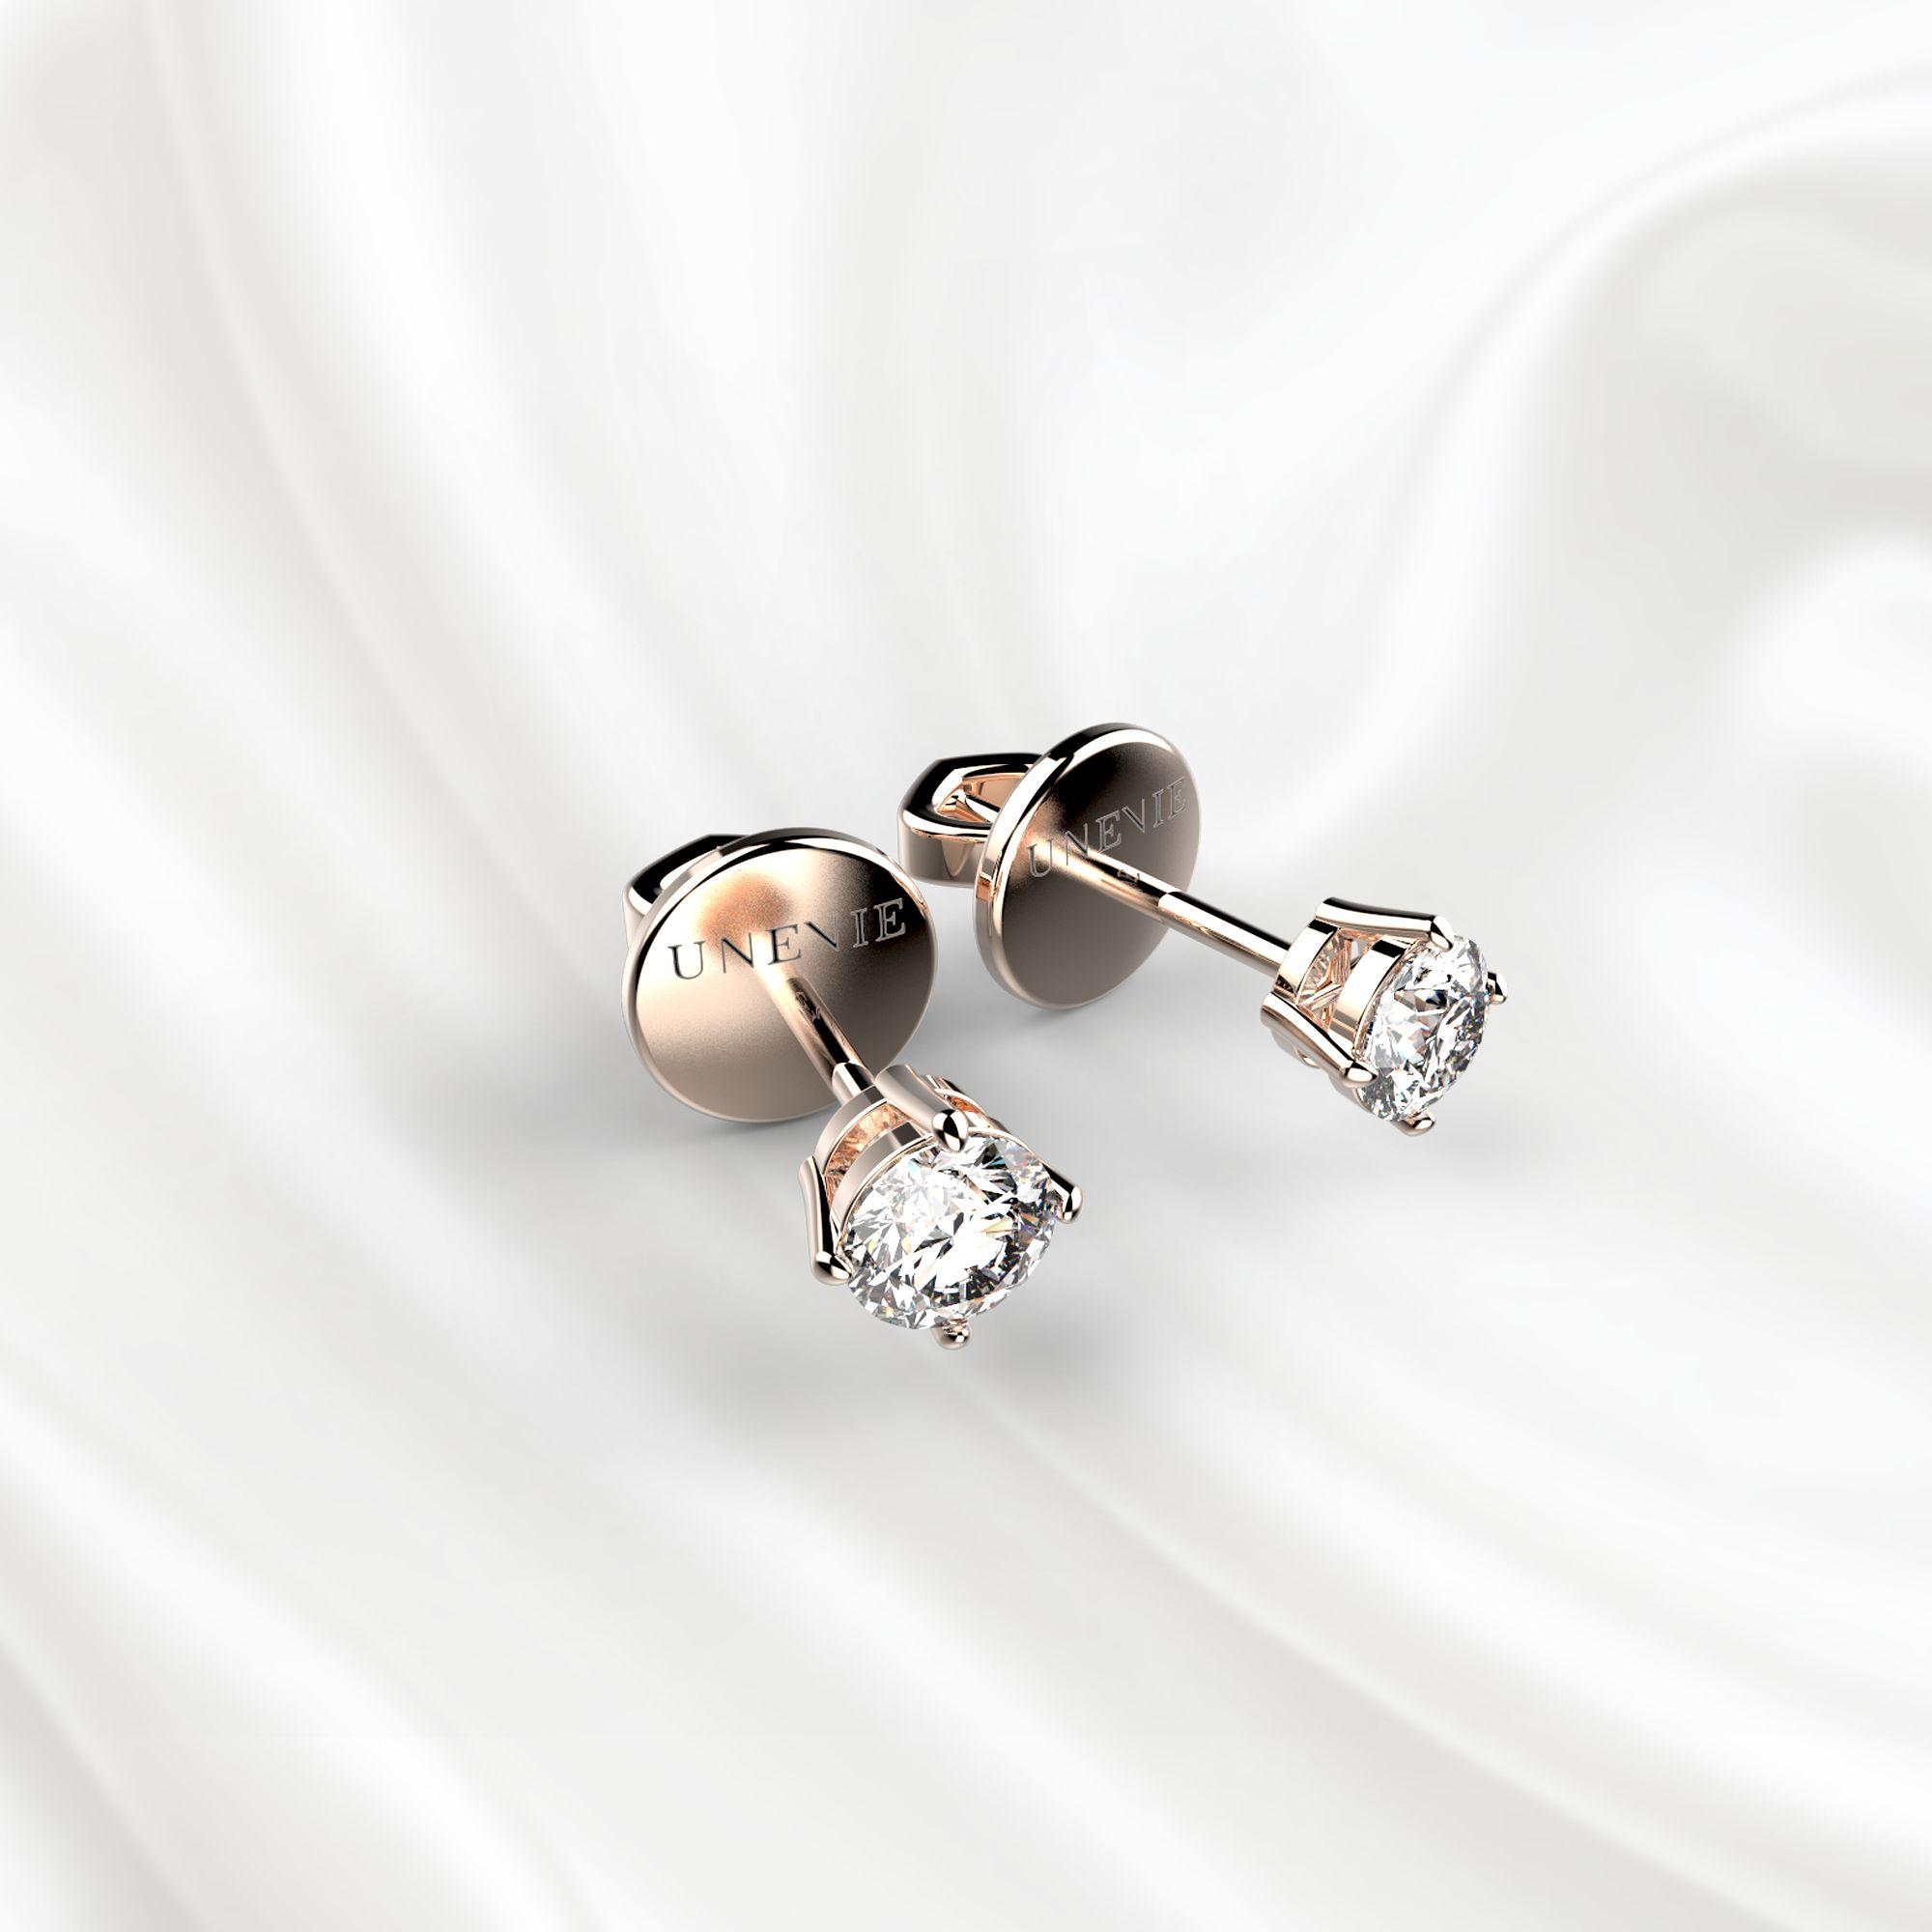 S3 Серьги из розового золота с бриллиантами 0,2 карат